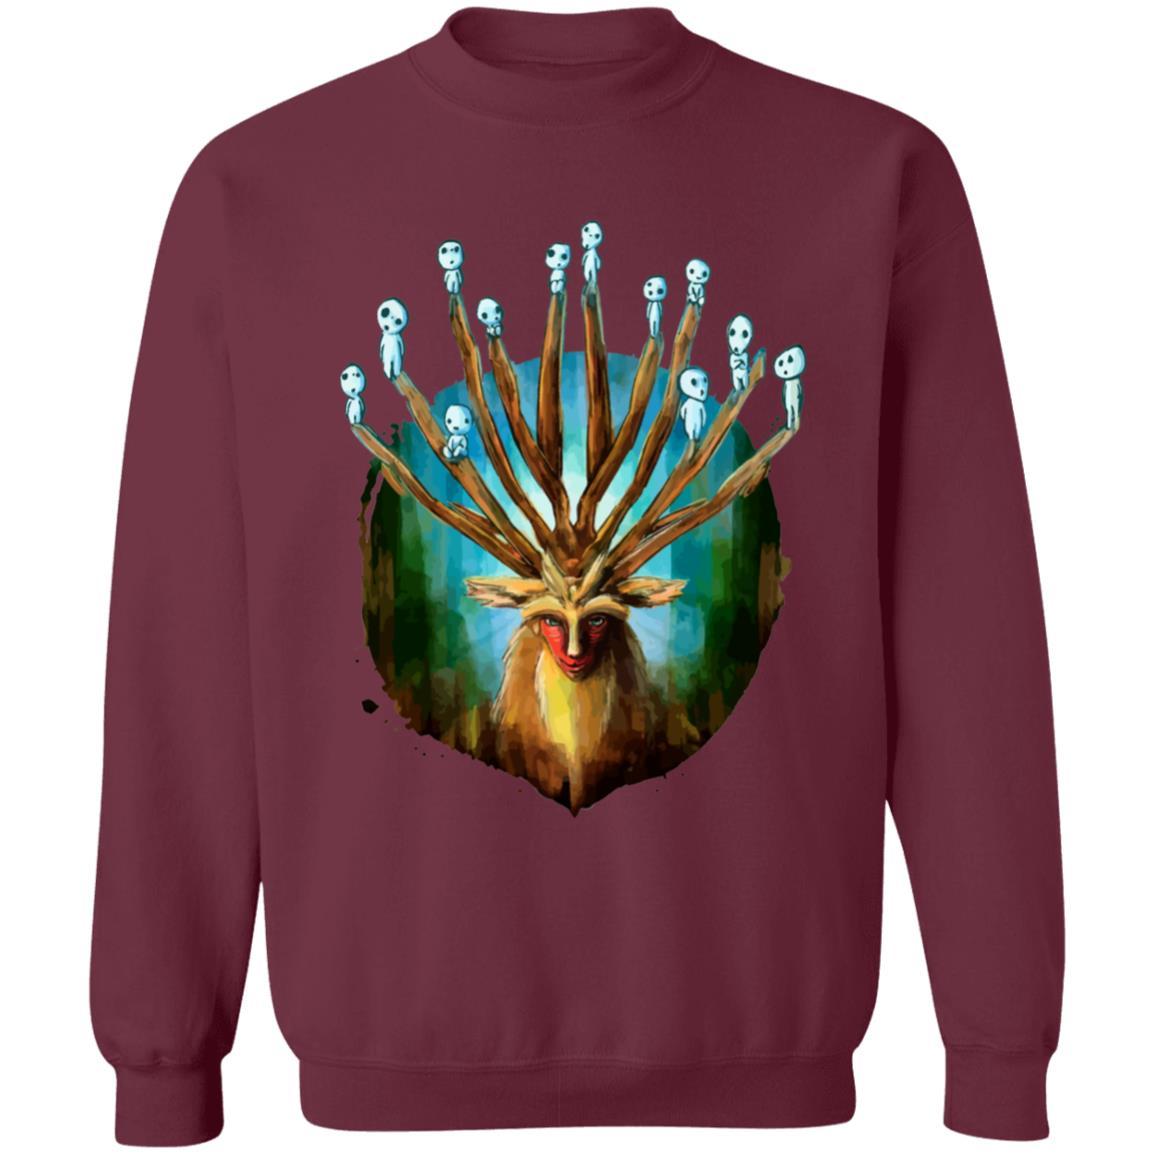 Princess Mononoke – Shishigami and The Tree Spirit Sweatshirt